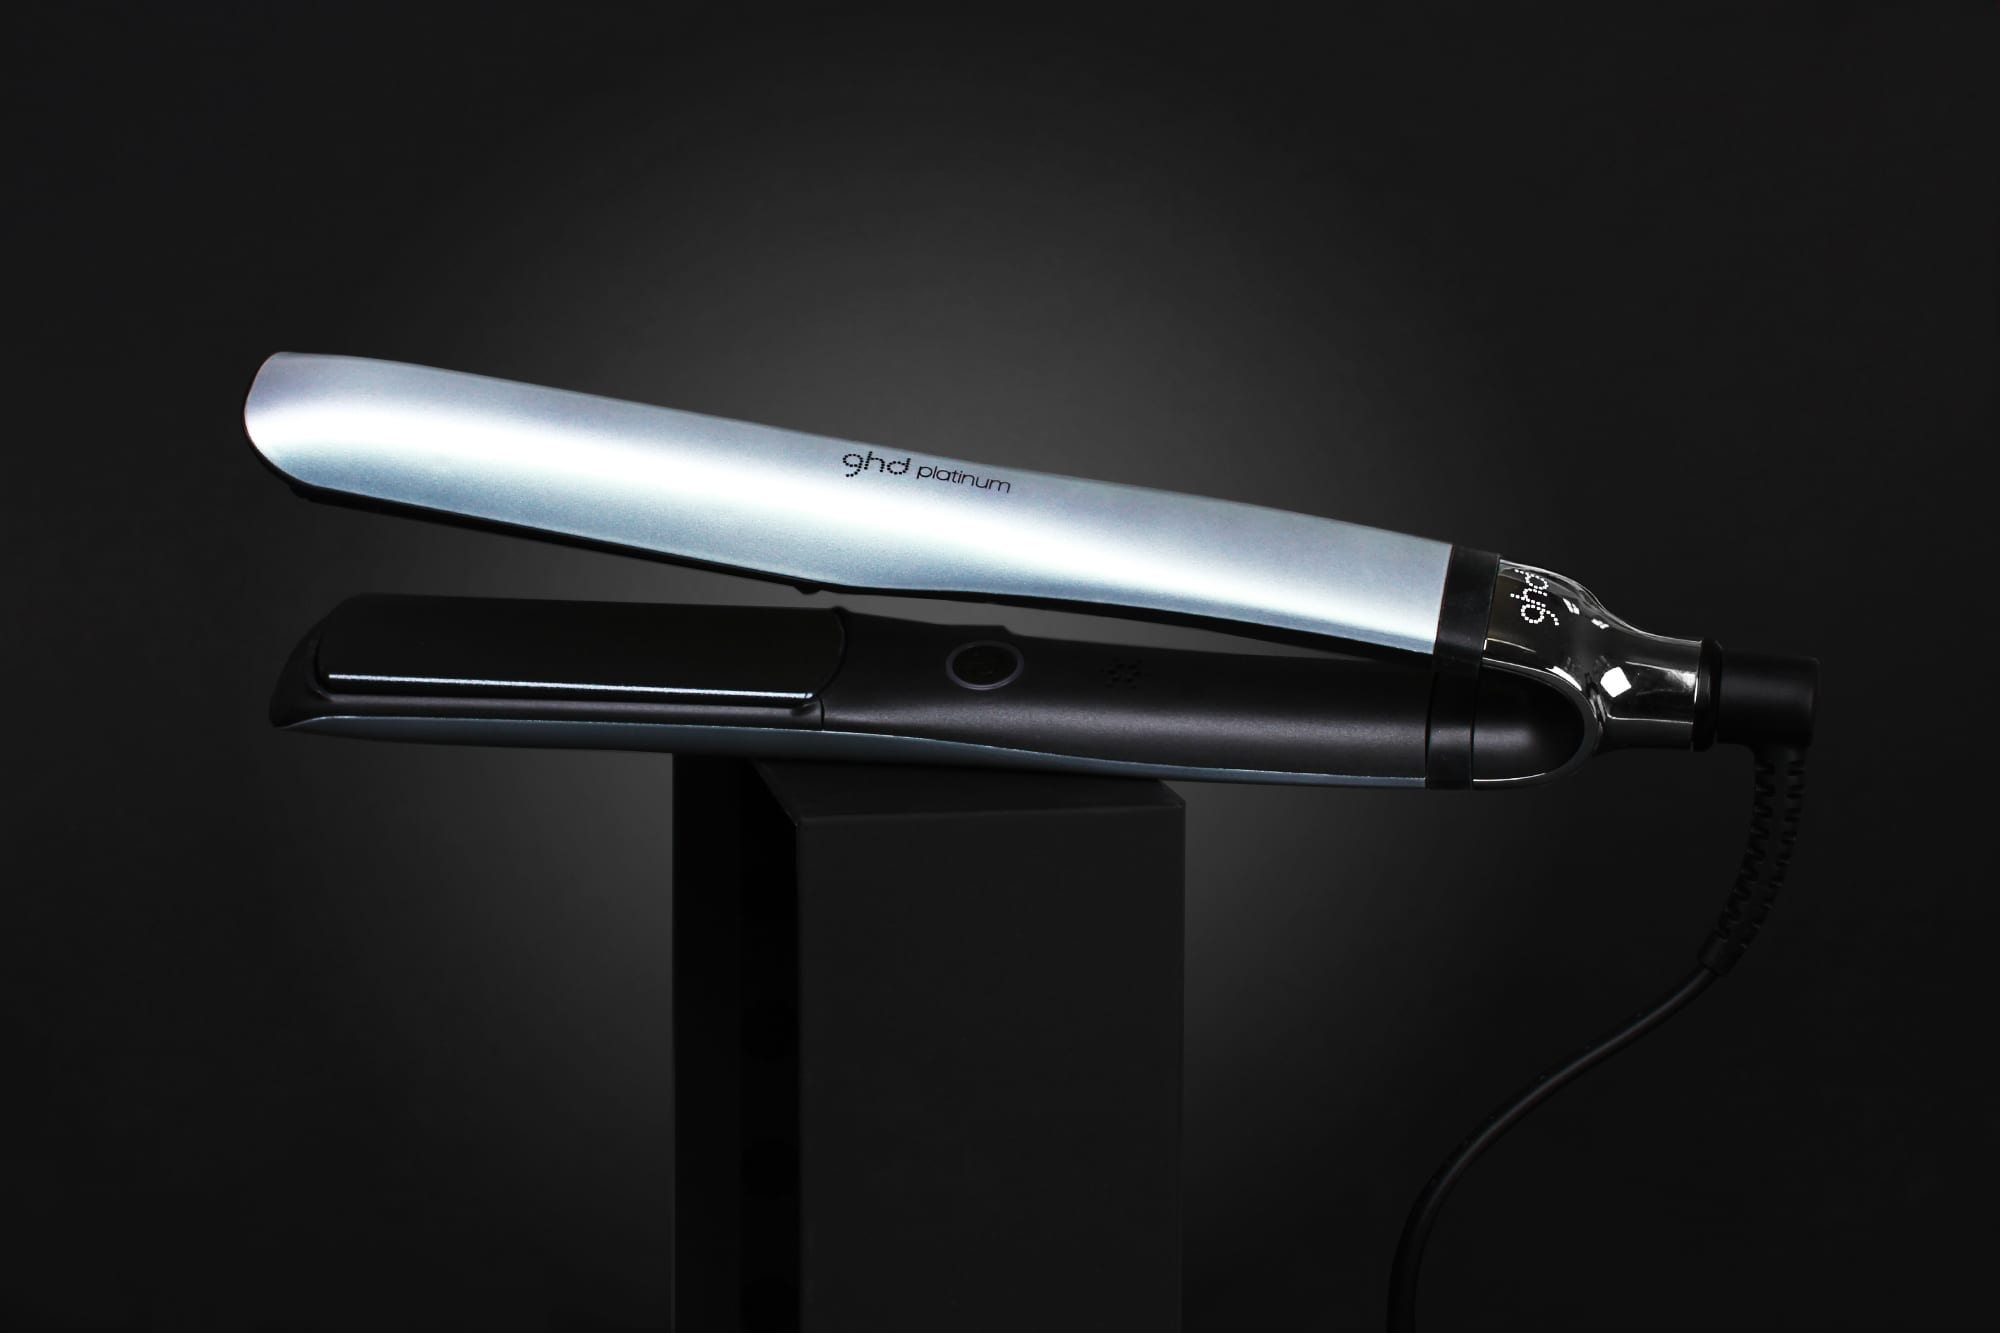 In The Spotlight: GHD Platinum Styler